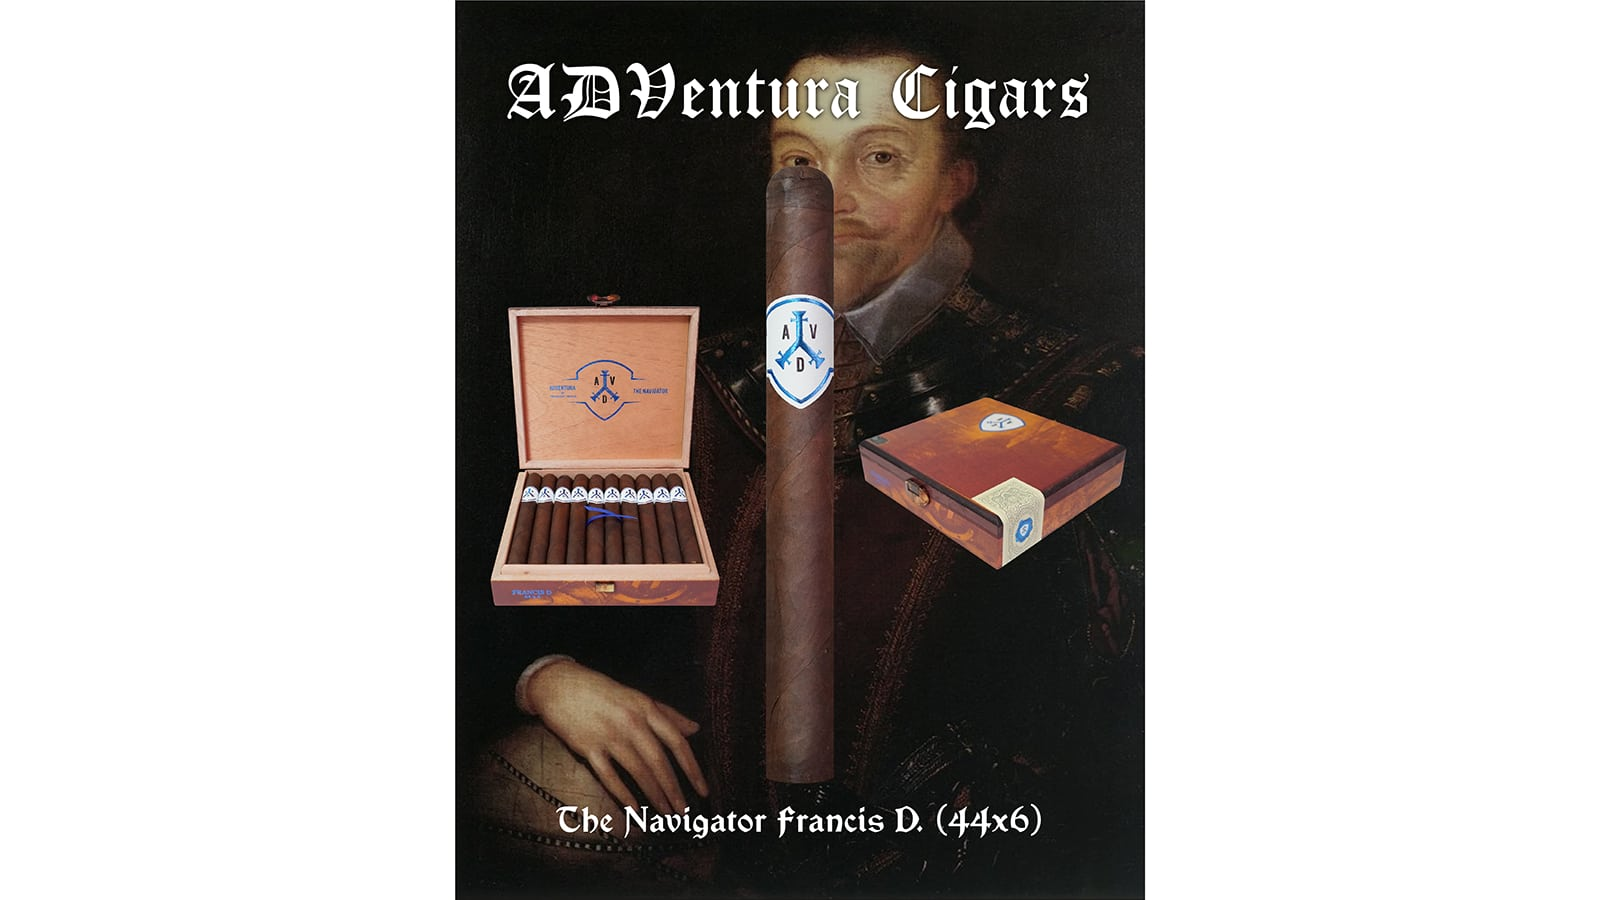 Adventura Navigator Francis D.